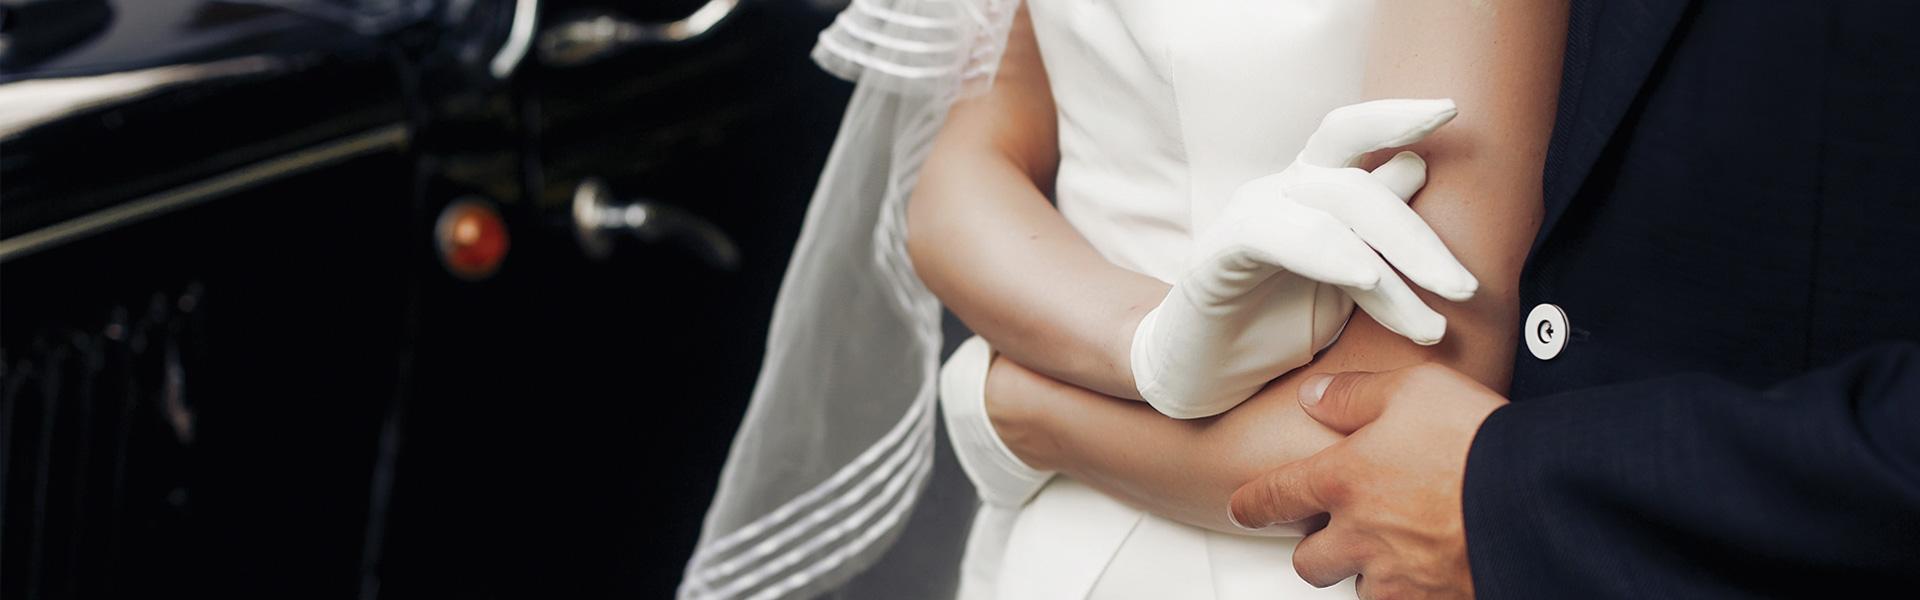 5 Royal Wedding Traditions